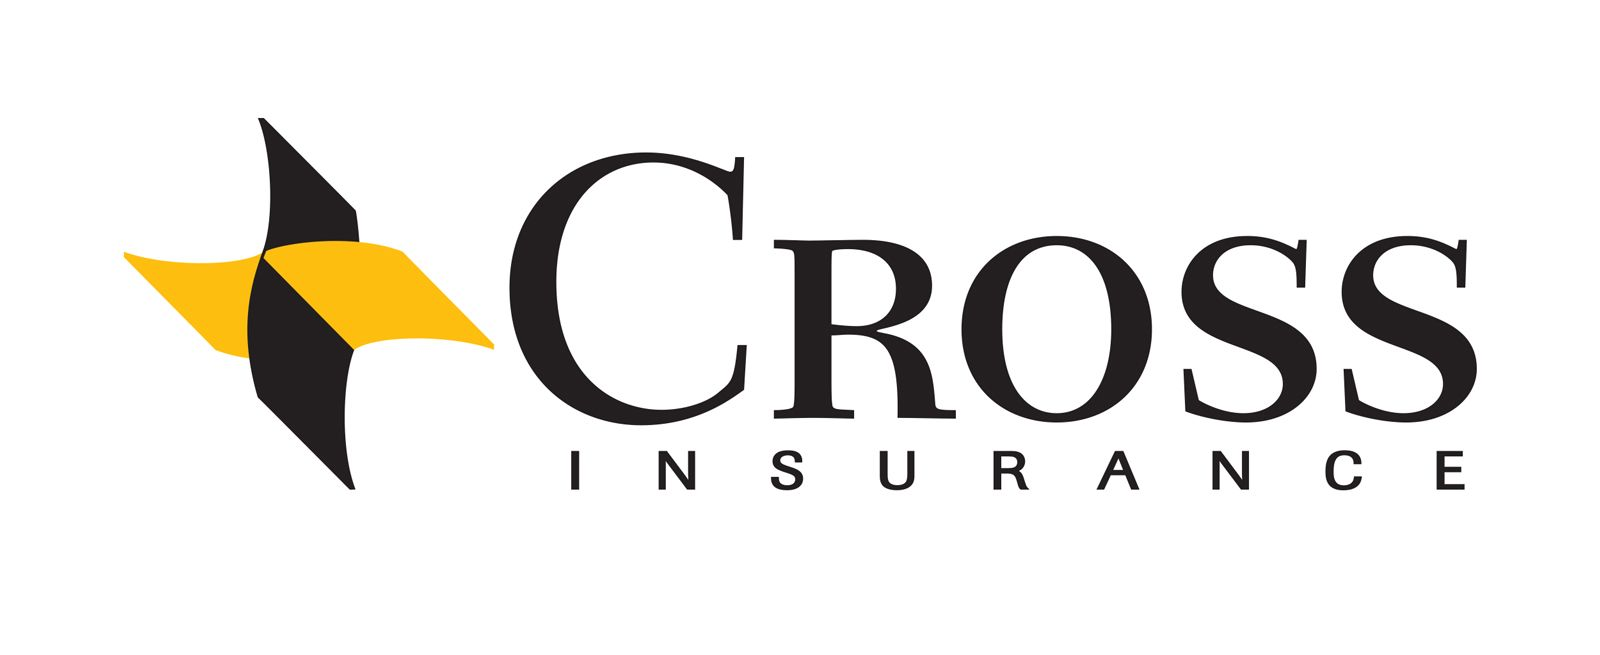 premiere-cross-ins-logo-half-height